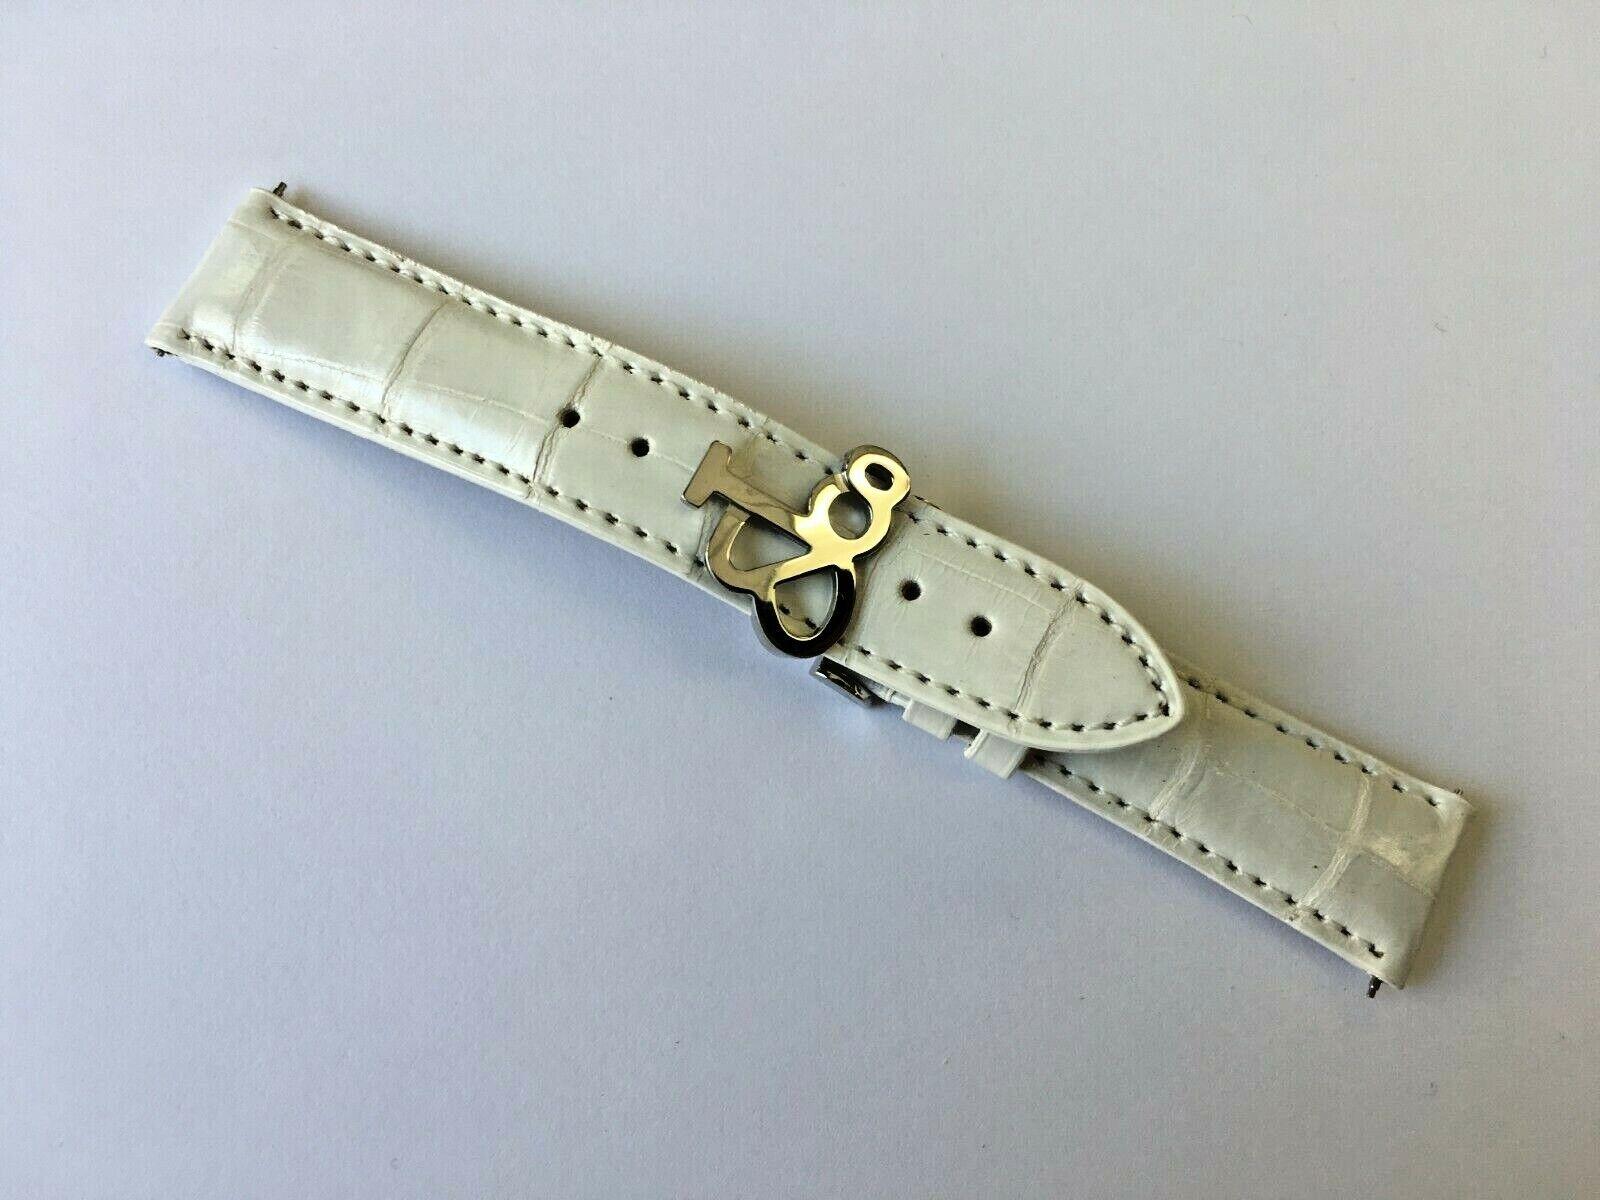 JACOB & COMPANY Uhrenarmband Alligator Weiß 20/18 mm mit Faltschliesse